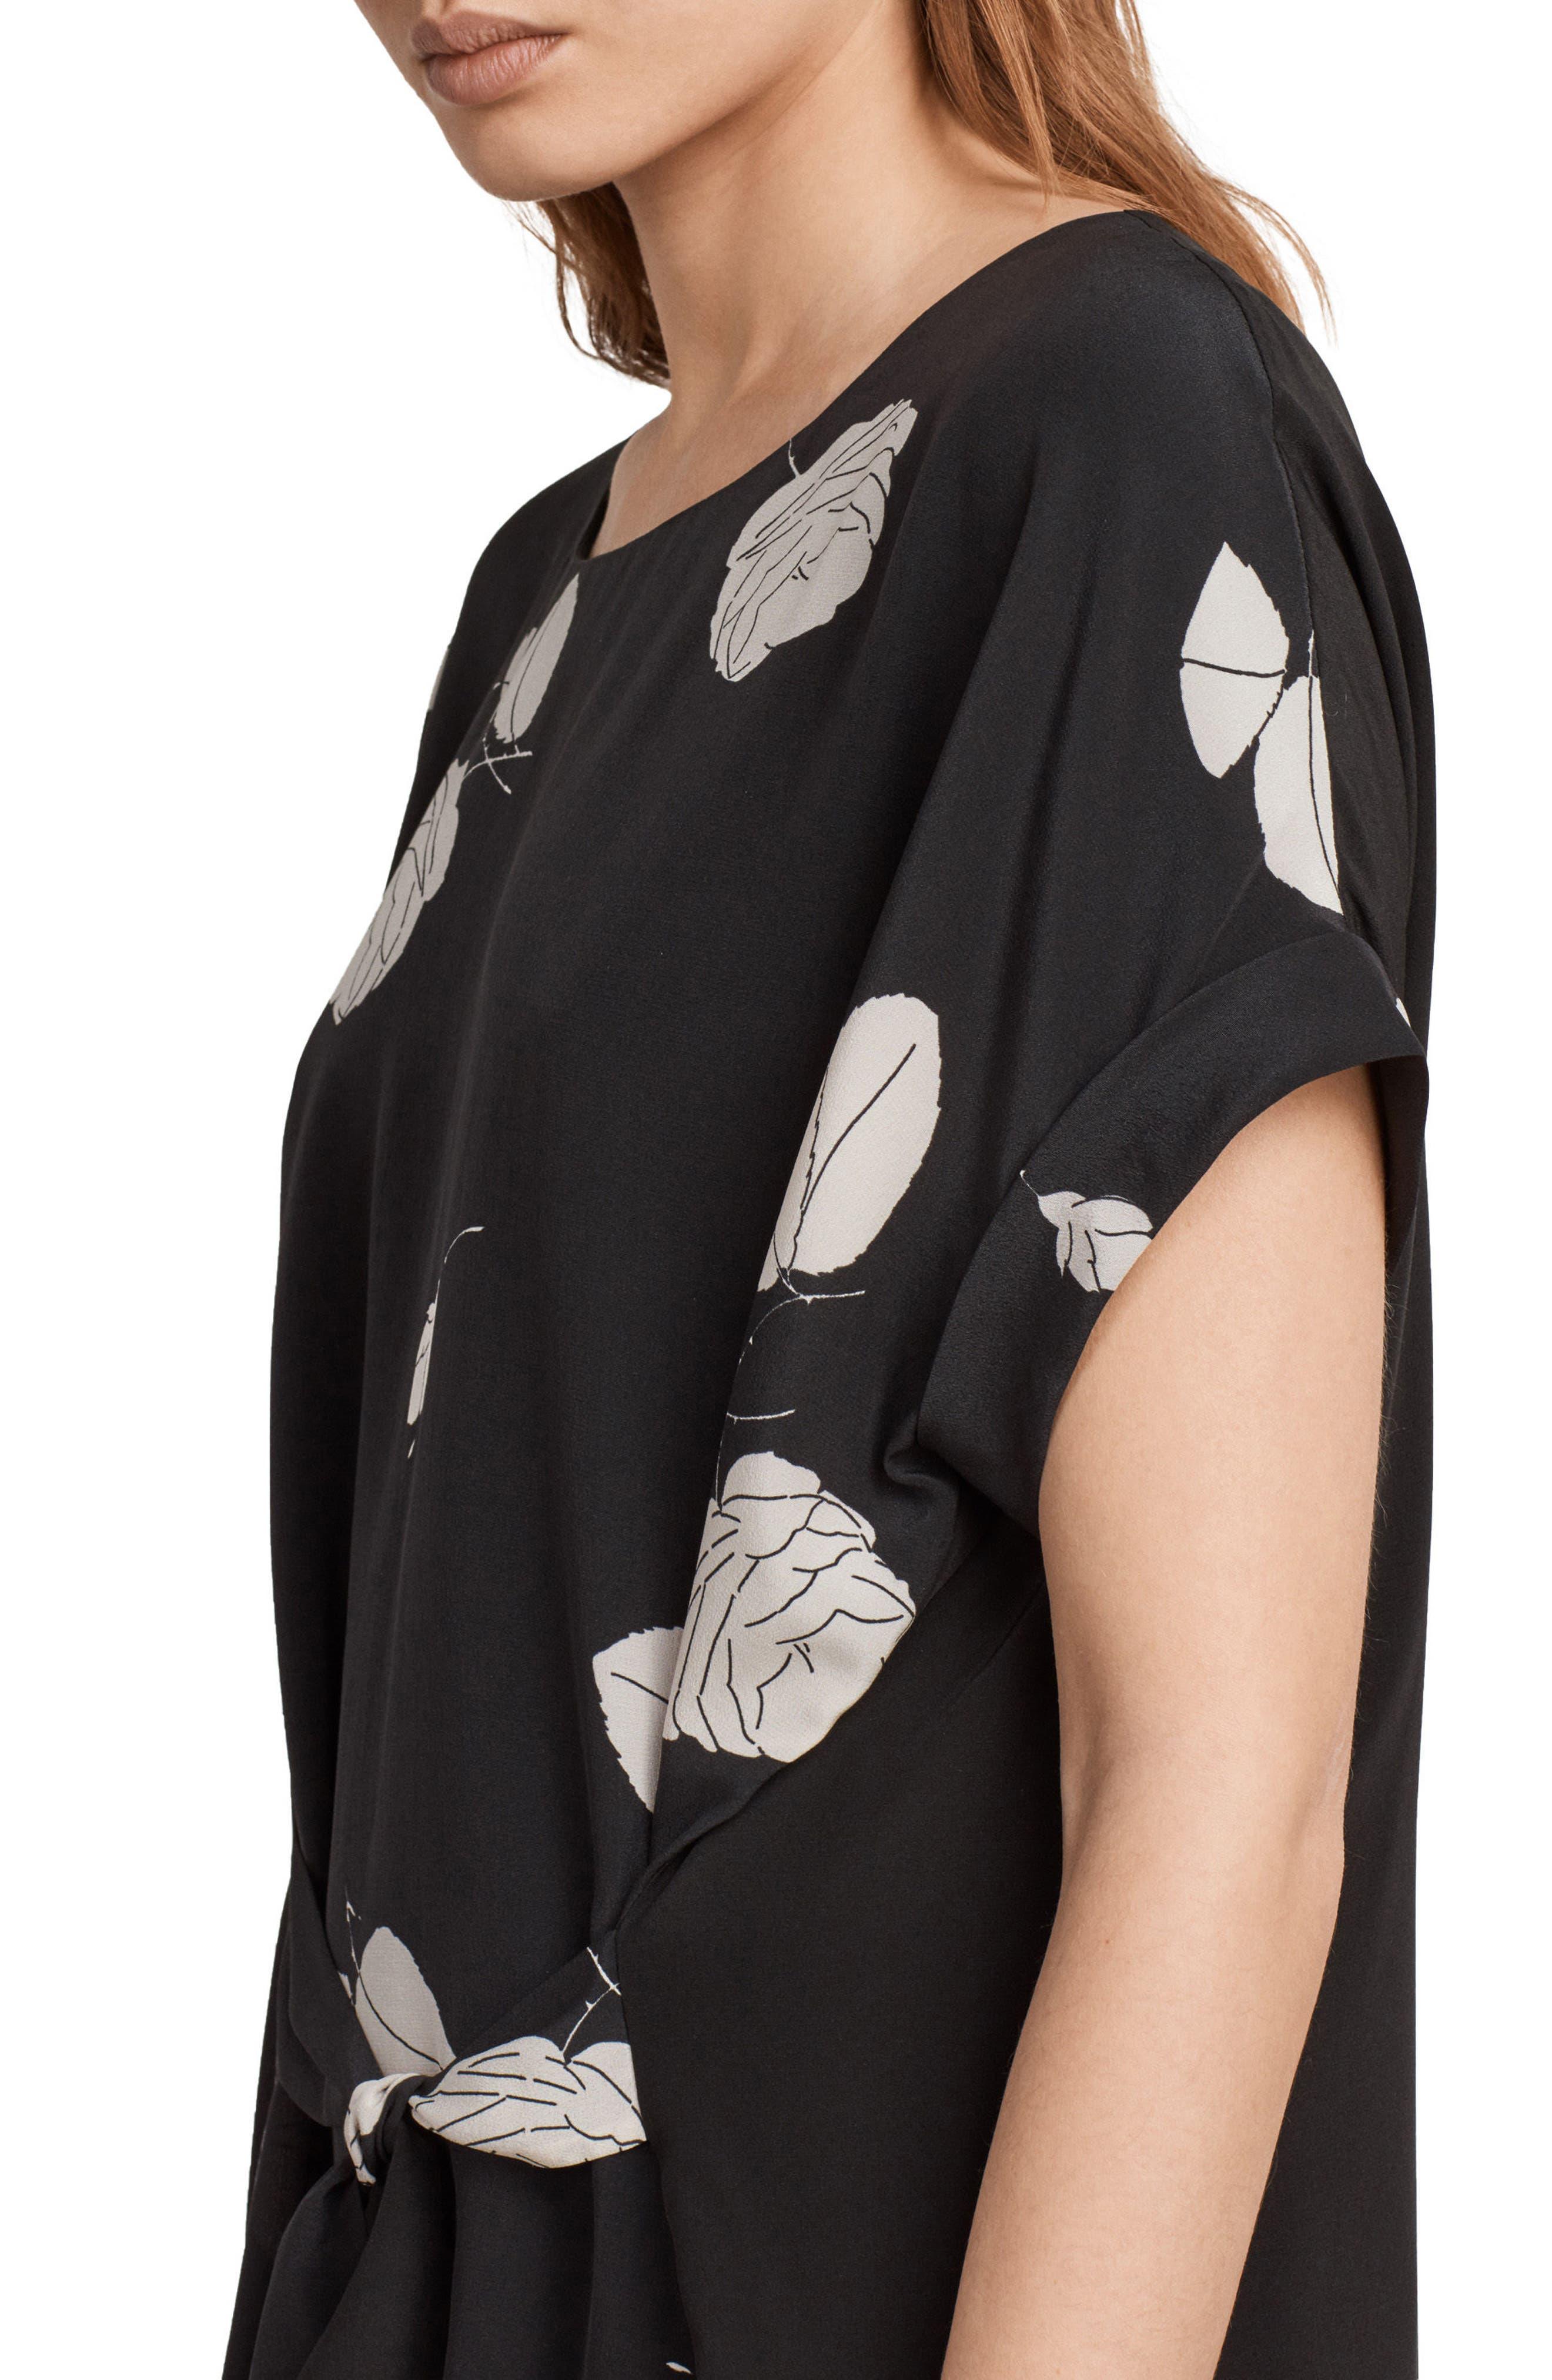 Sonny Rodin Silk Dress,                             Alternate thumbnail 4, color,